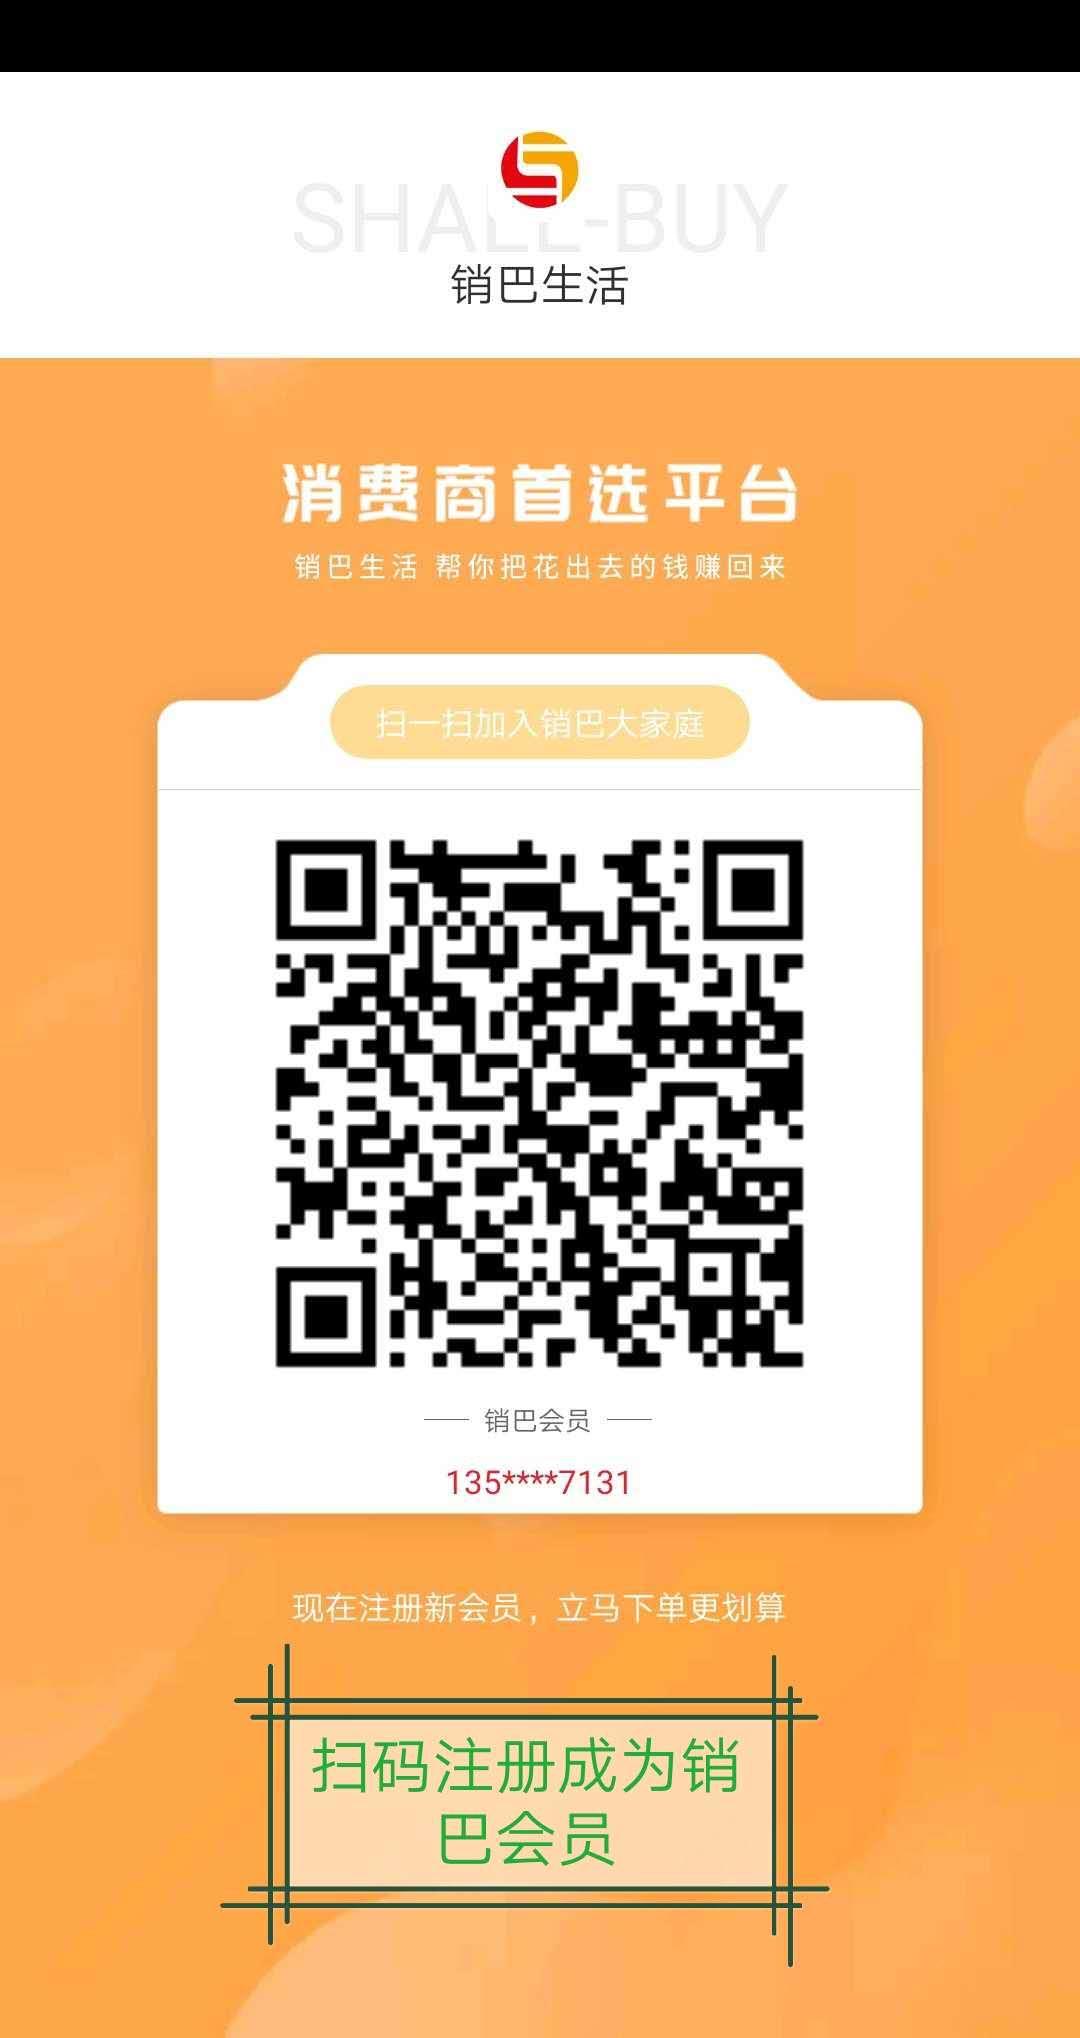 https://xiaoba.shall-buy.com/attachment/images/15161/2019/05/LA51a52ZRr21H552zHSRbbz5RrkJbJ.jpg